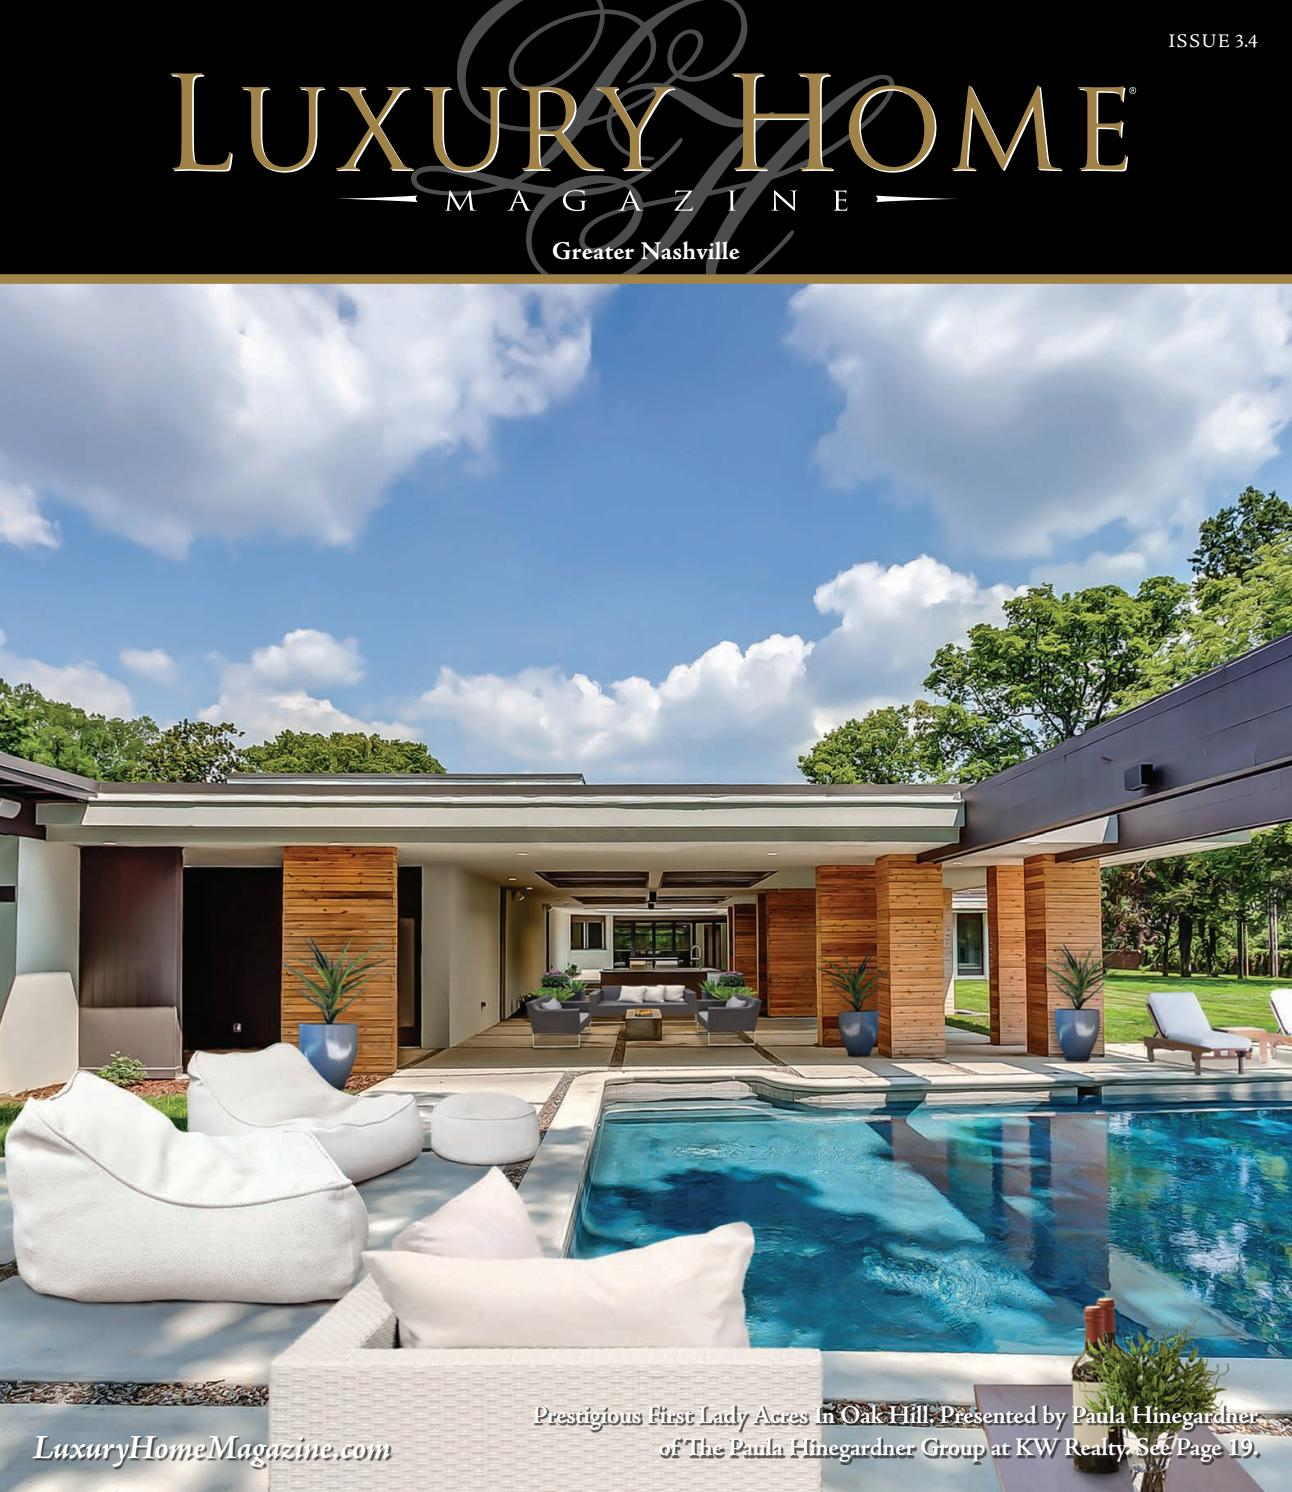 Luxury Home Magazine Nashville Issue 3 4 by Luxury Home Magazine issuu